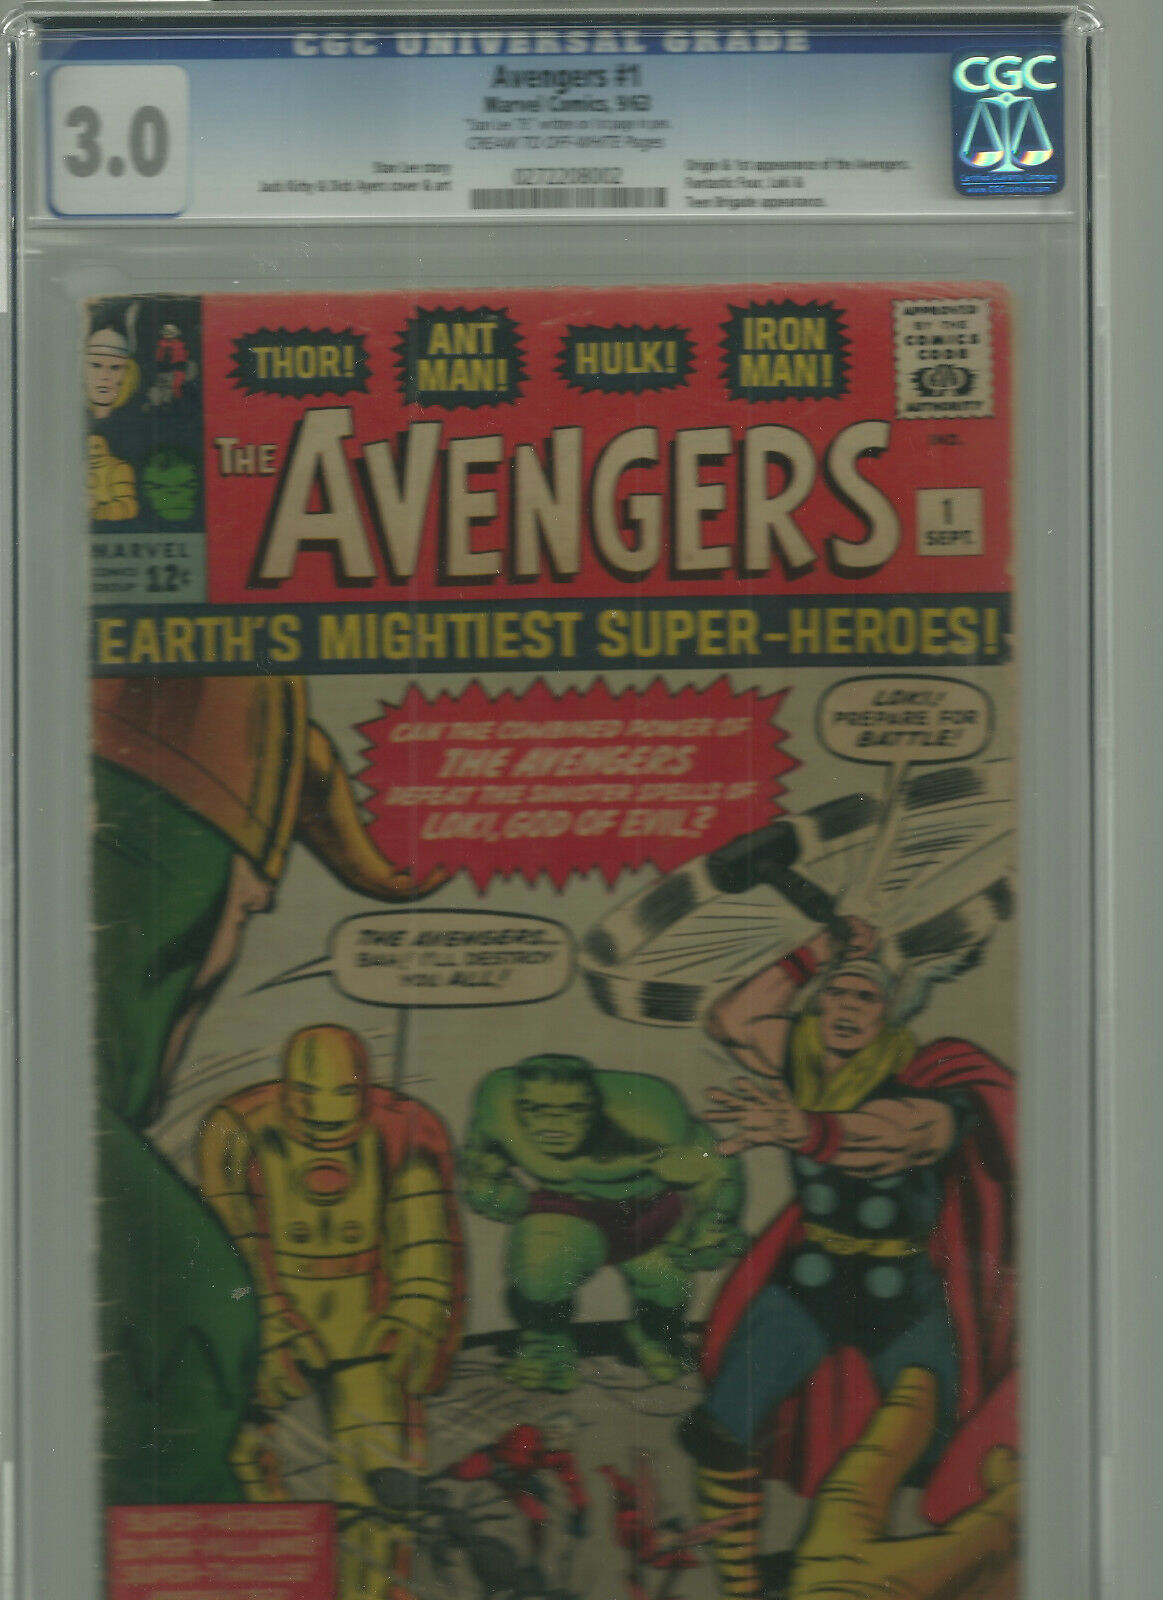 AVENGERS COLLECTION 1- 263+ dbls abt 325 comics, #1 CGC 3.0 Stan Lee Auto